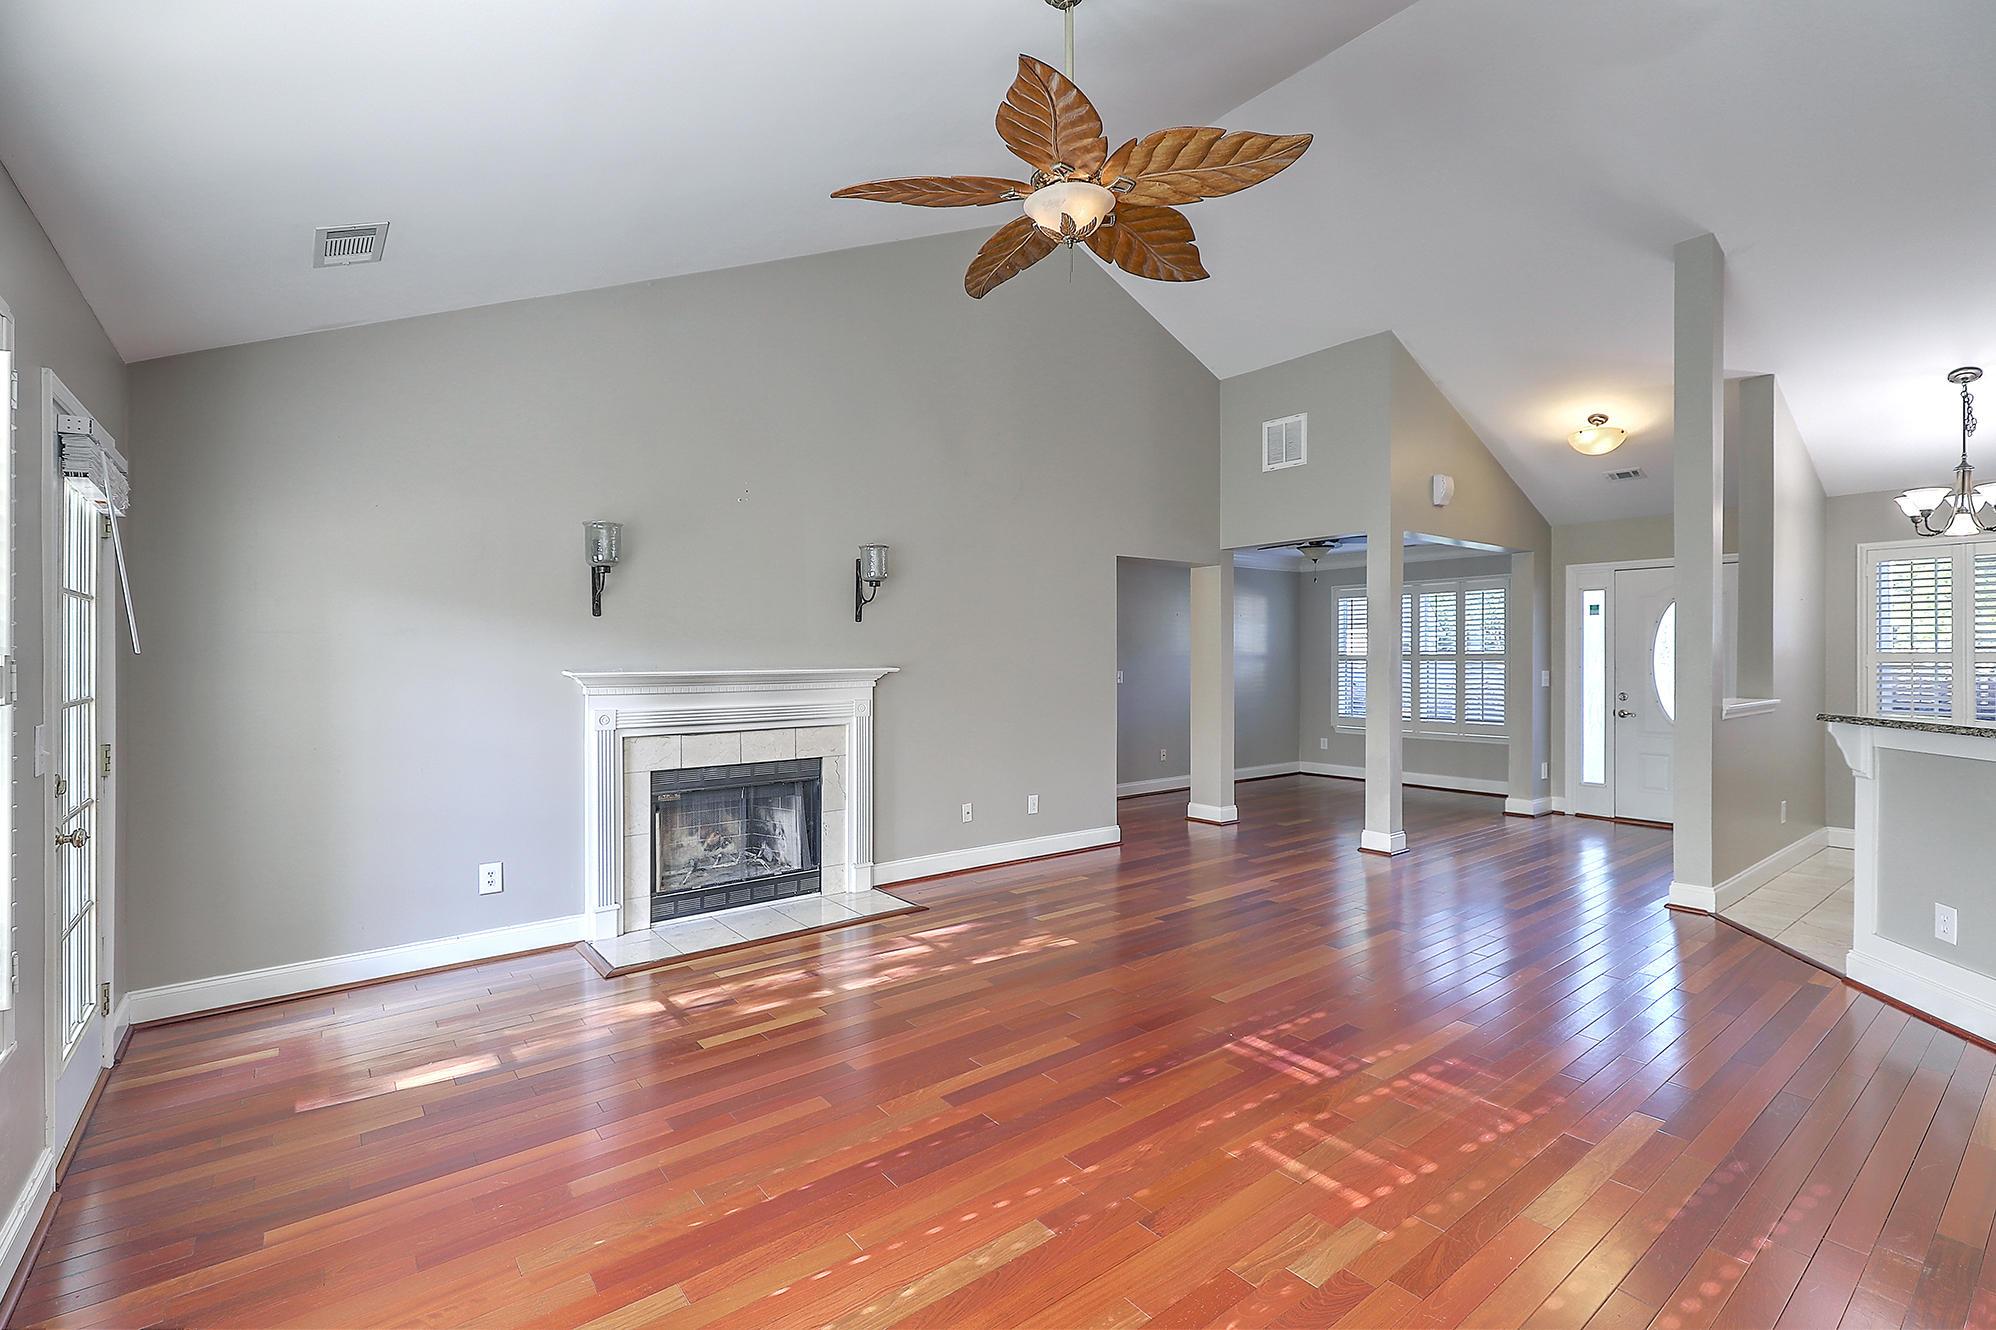 Planters Pointe Homes For Sale - 2740 Four Winds, Mount Pleasant, SC - 7